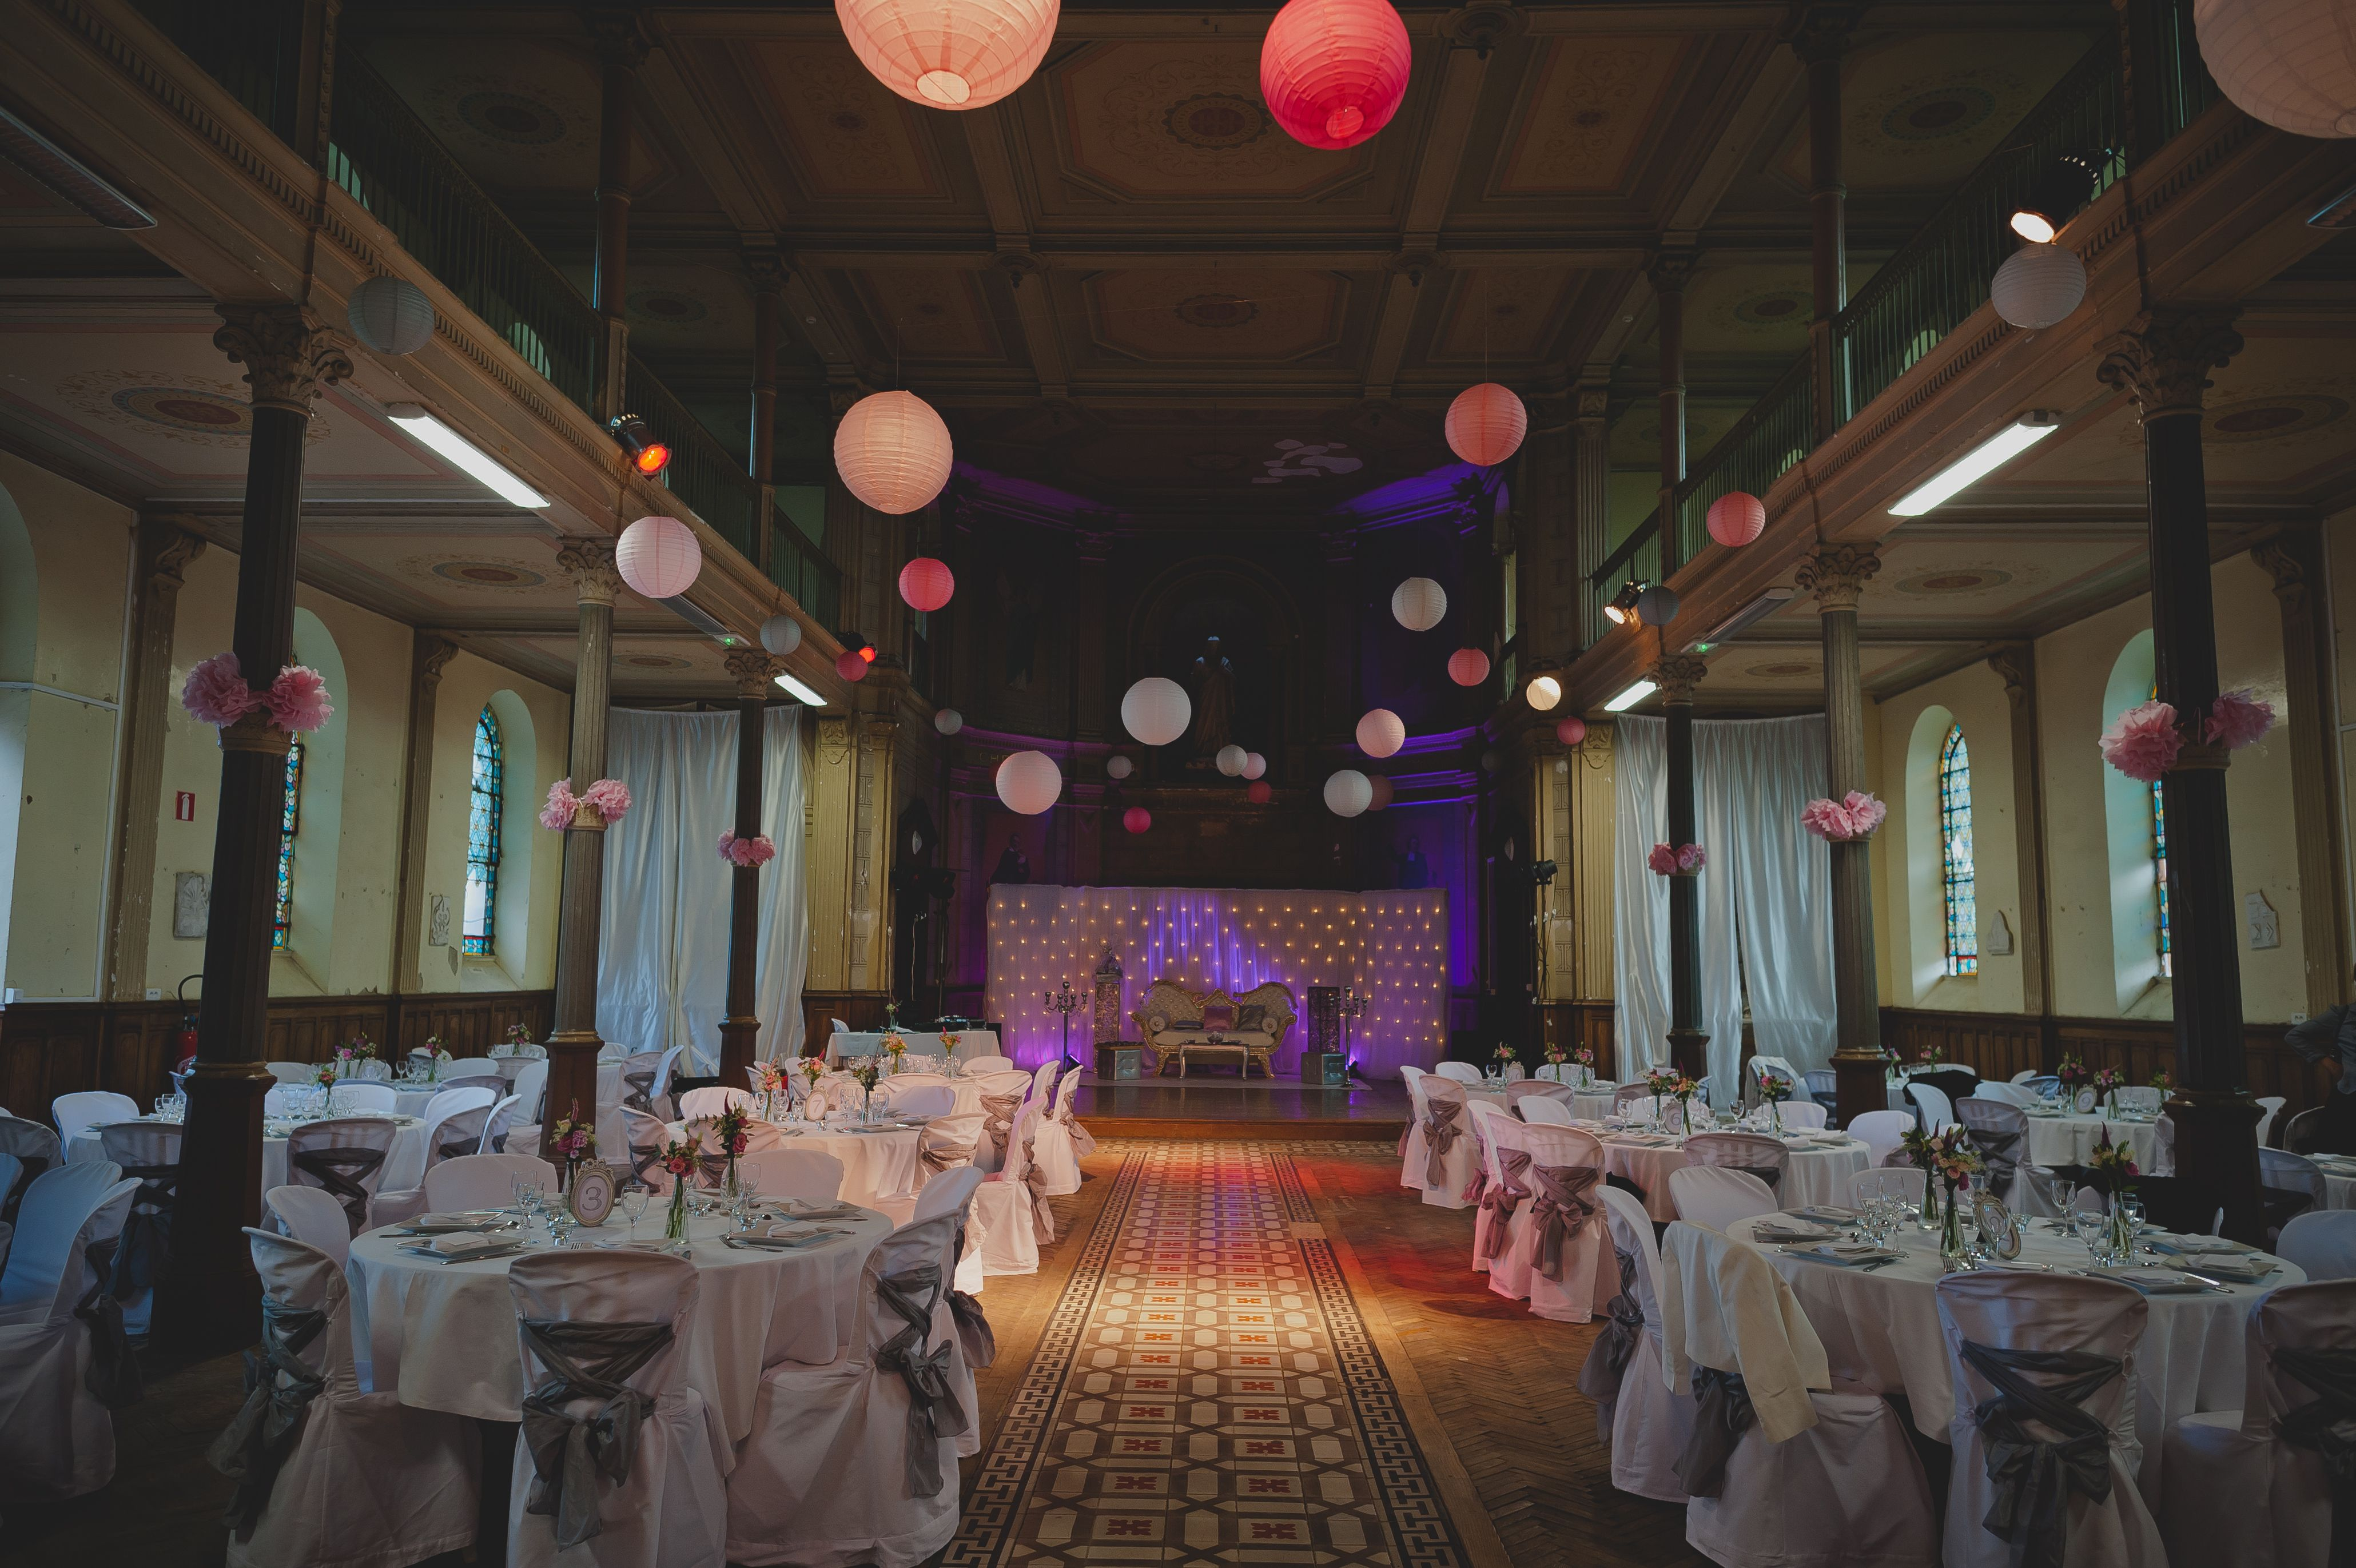 Wedding decoration ideas kerala  lumineers  my wedding  Pinterest  Wedding